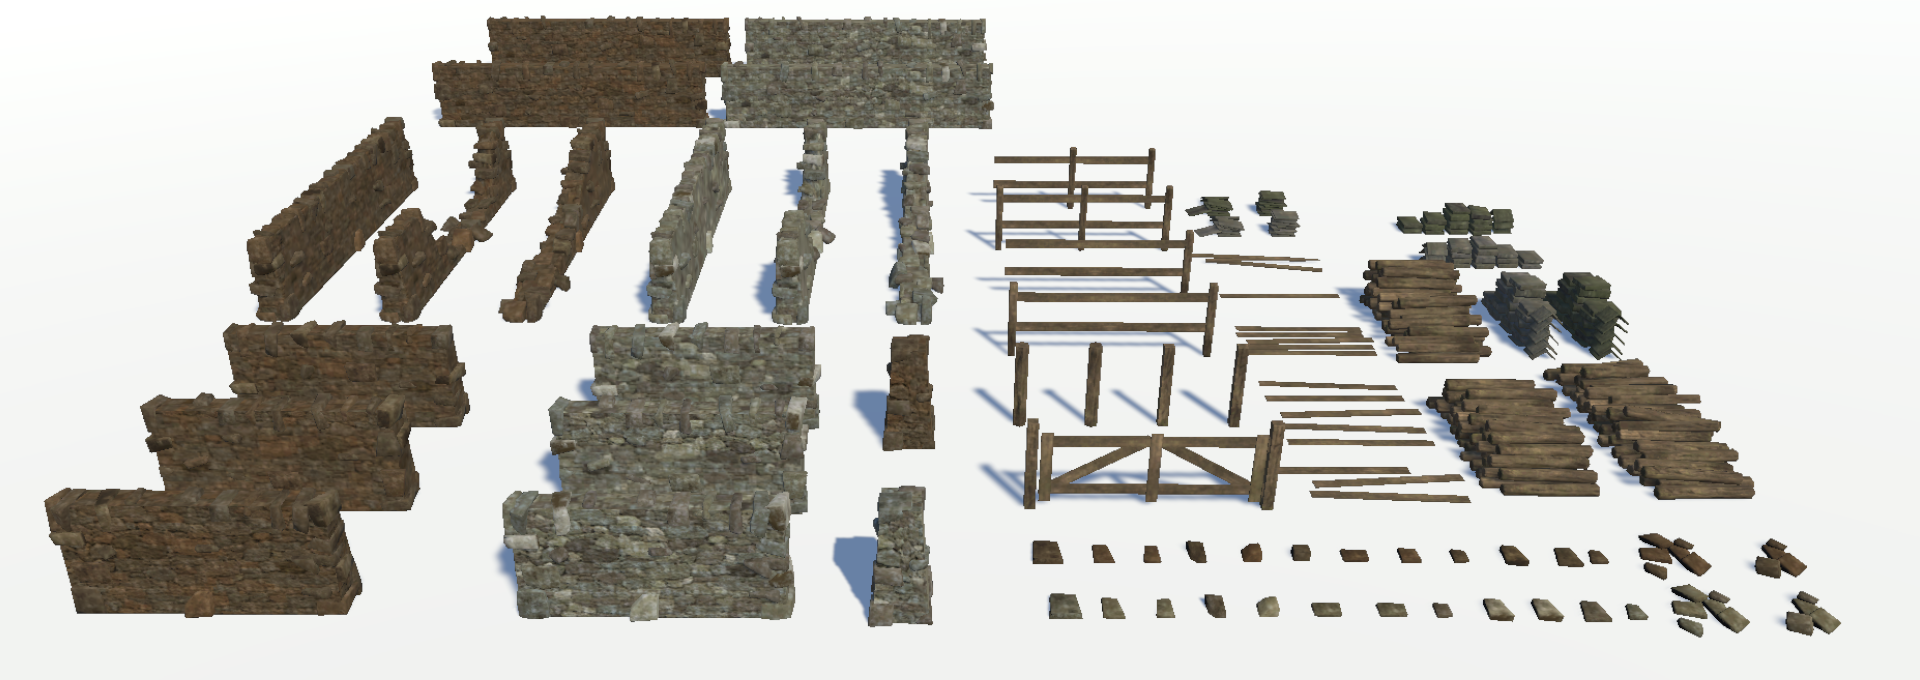 LBEnviroPk1_assets_sans_buildings_trimmed.png